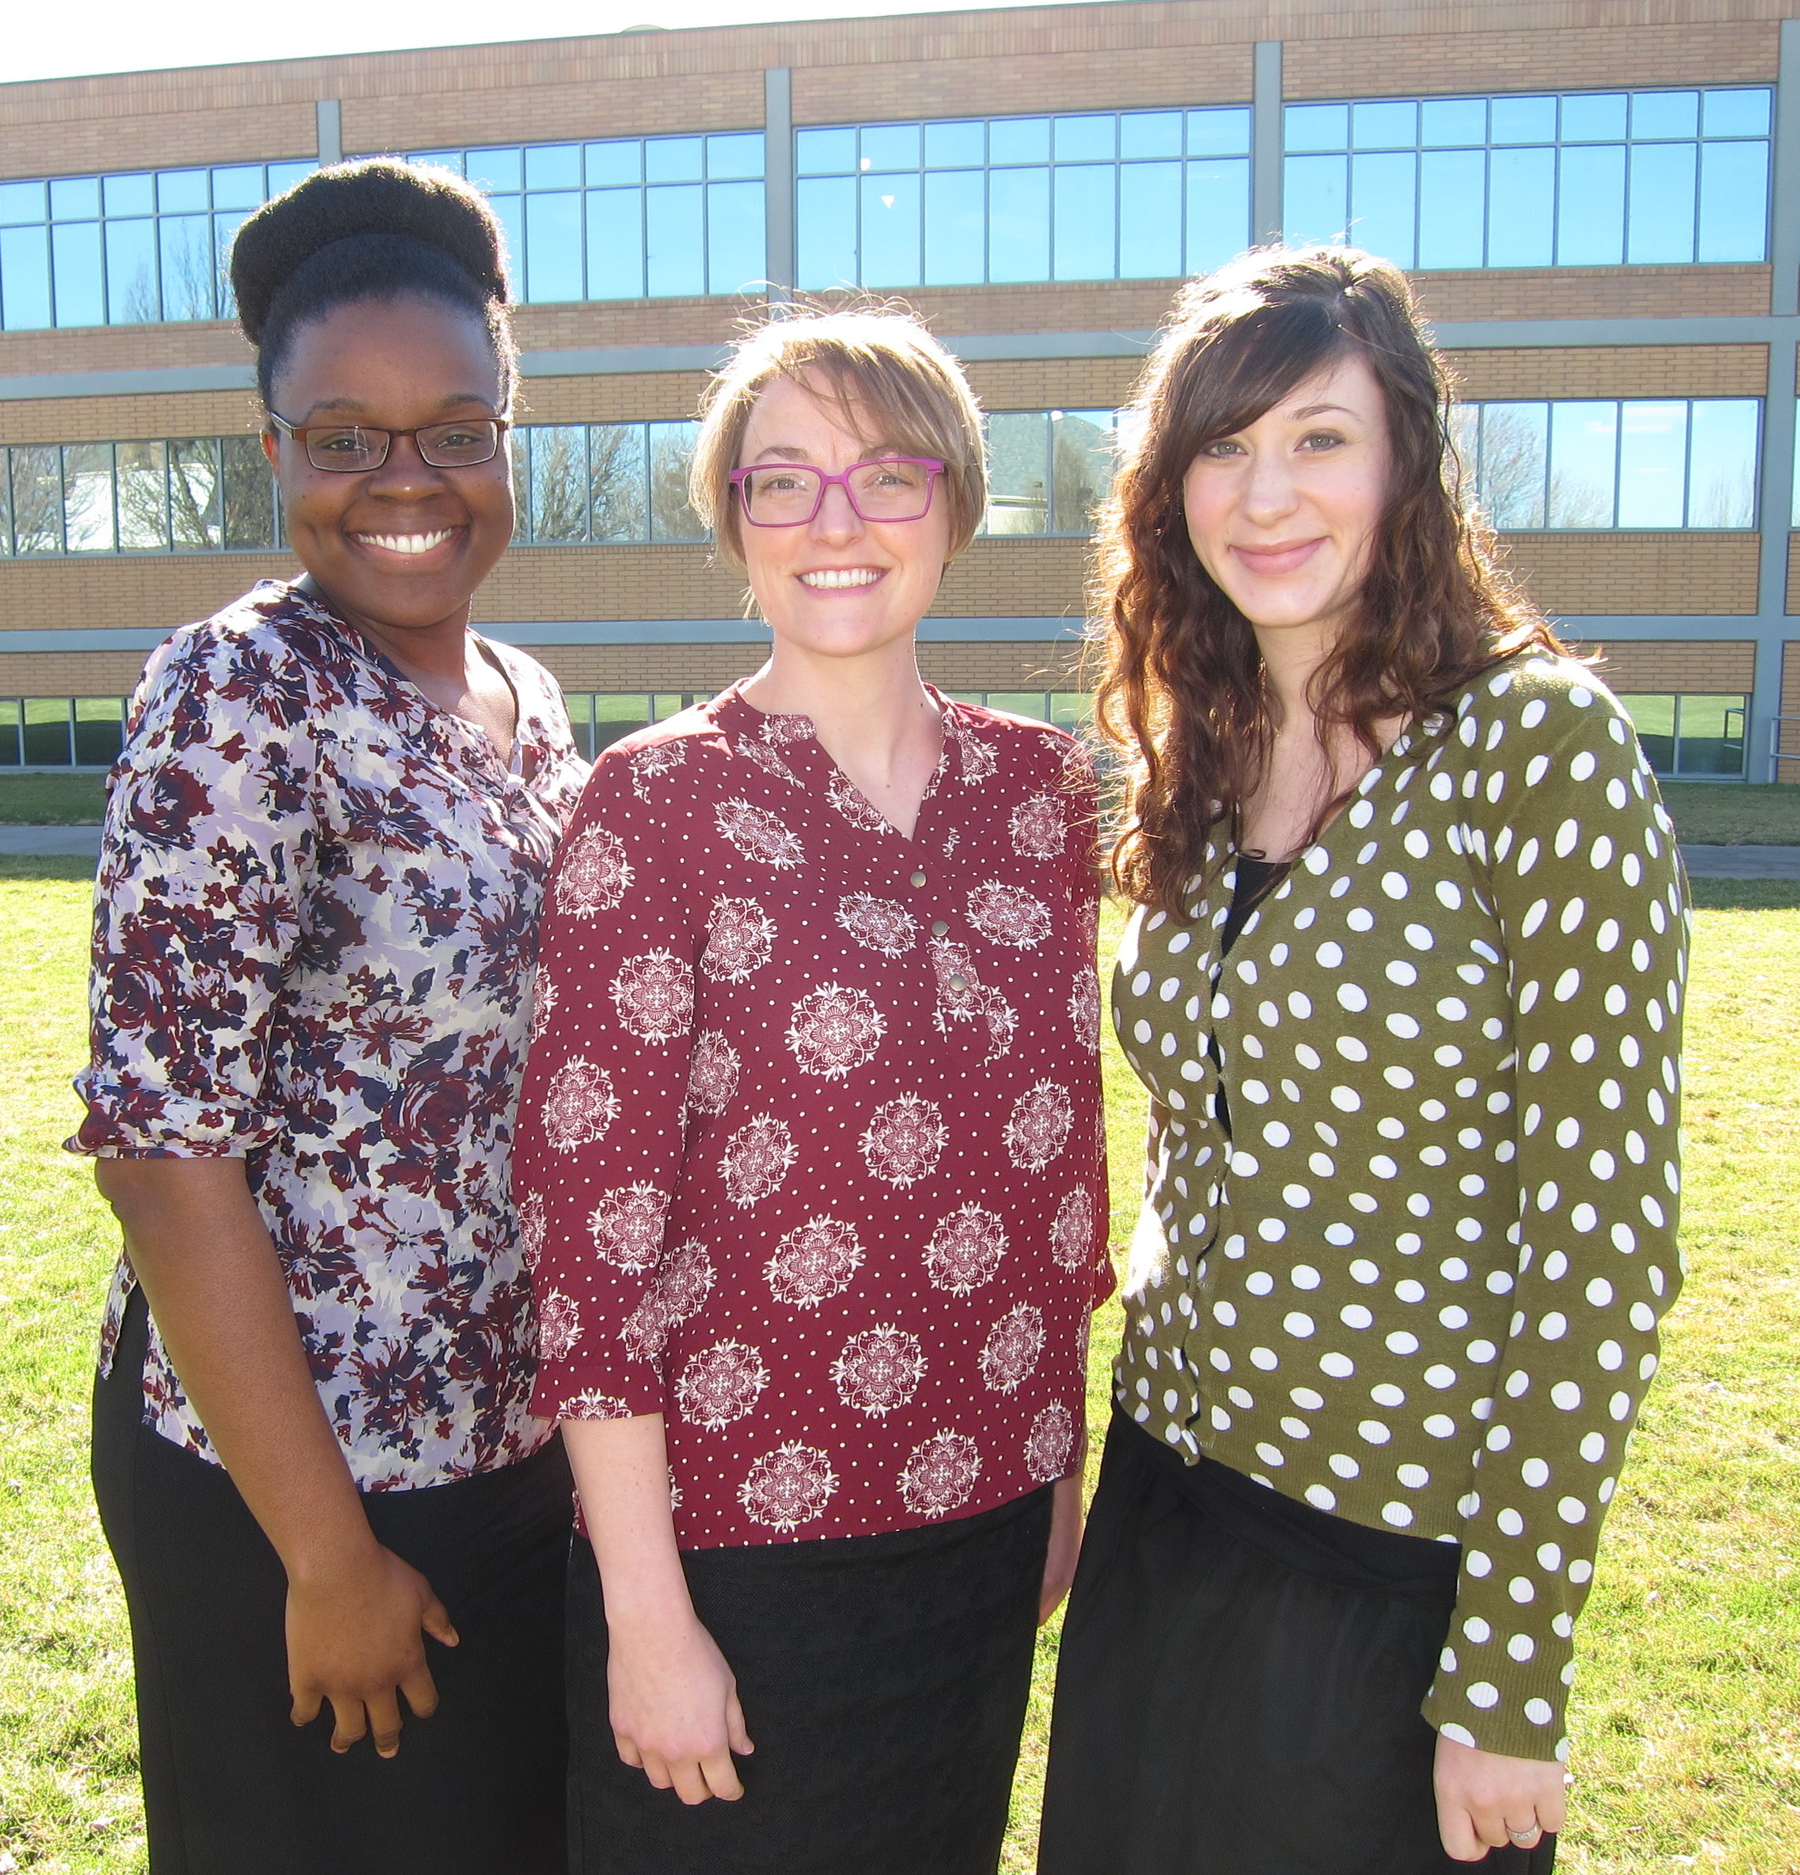 (Left to right) Alareece collie, Jenn Ogden, Jaimie Derting Photo by Kris Loewen